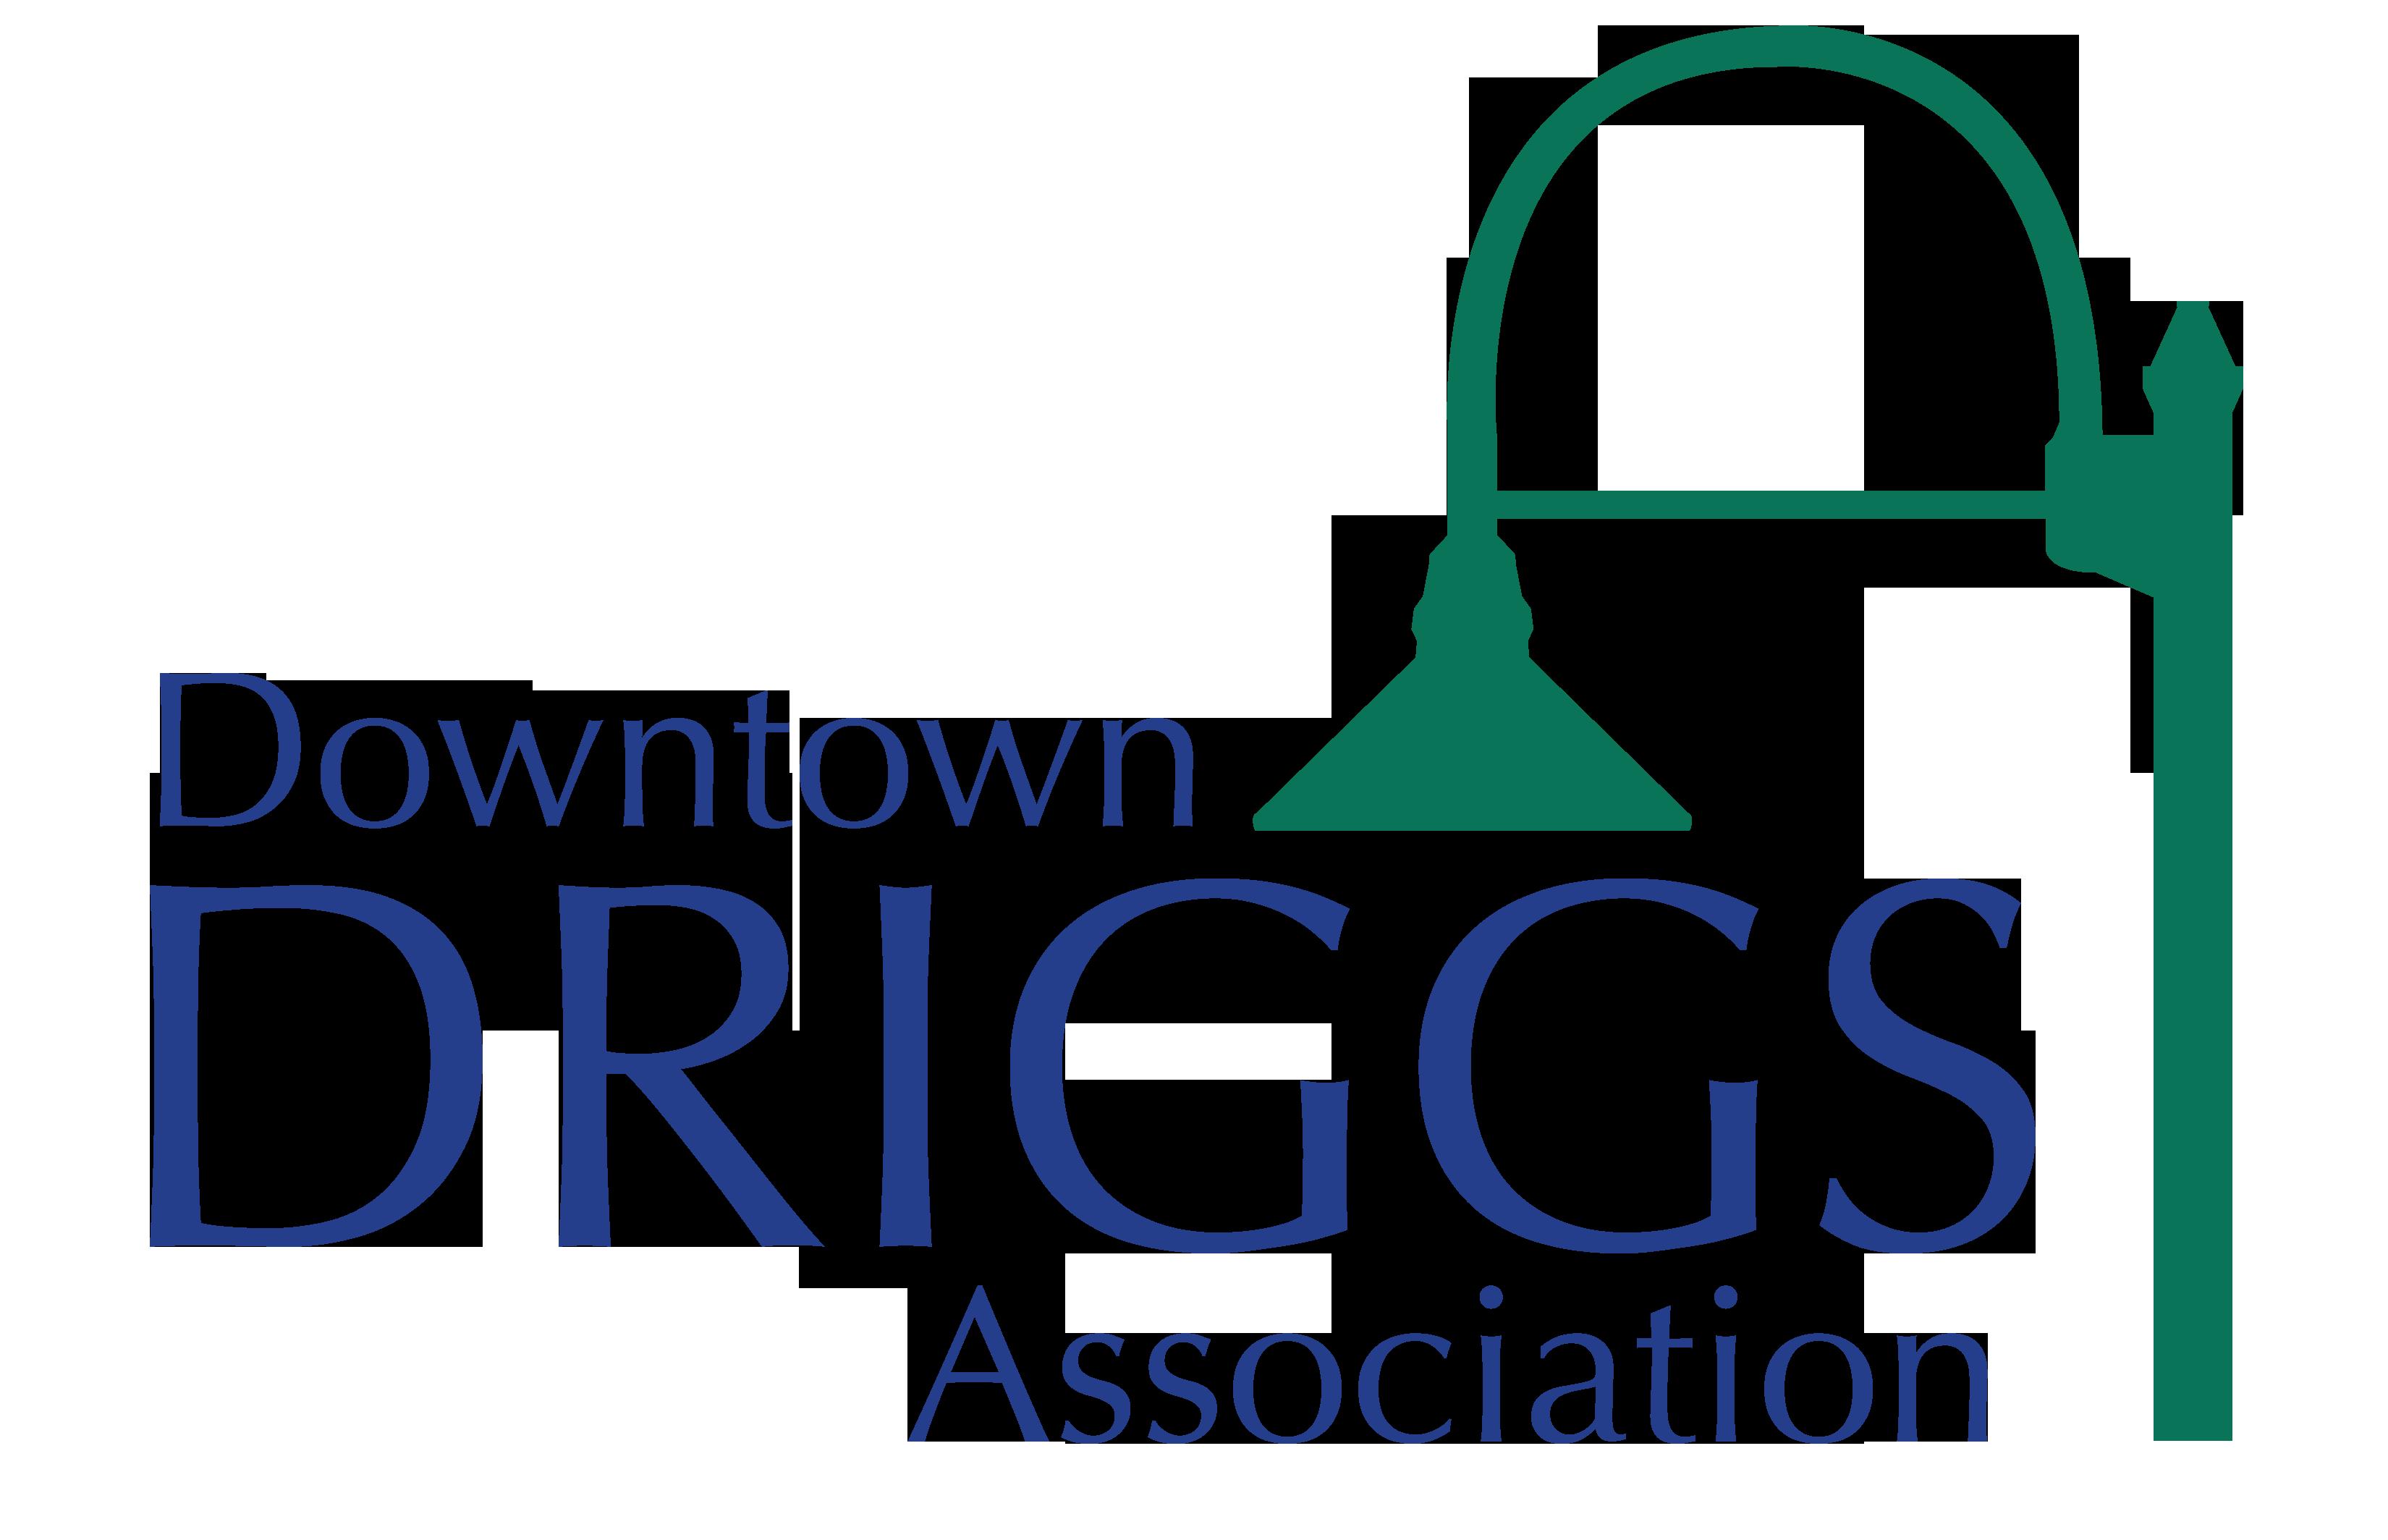 Downtown Driggs Association